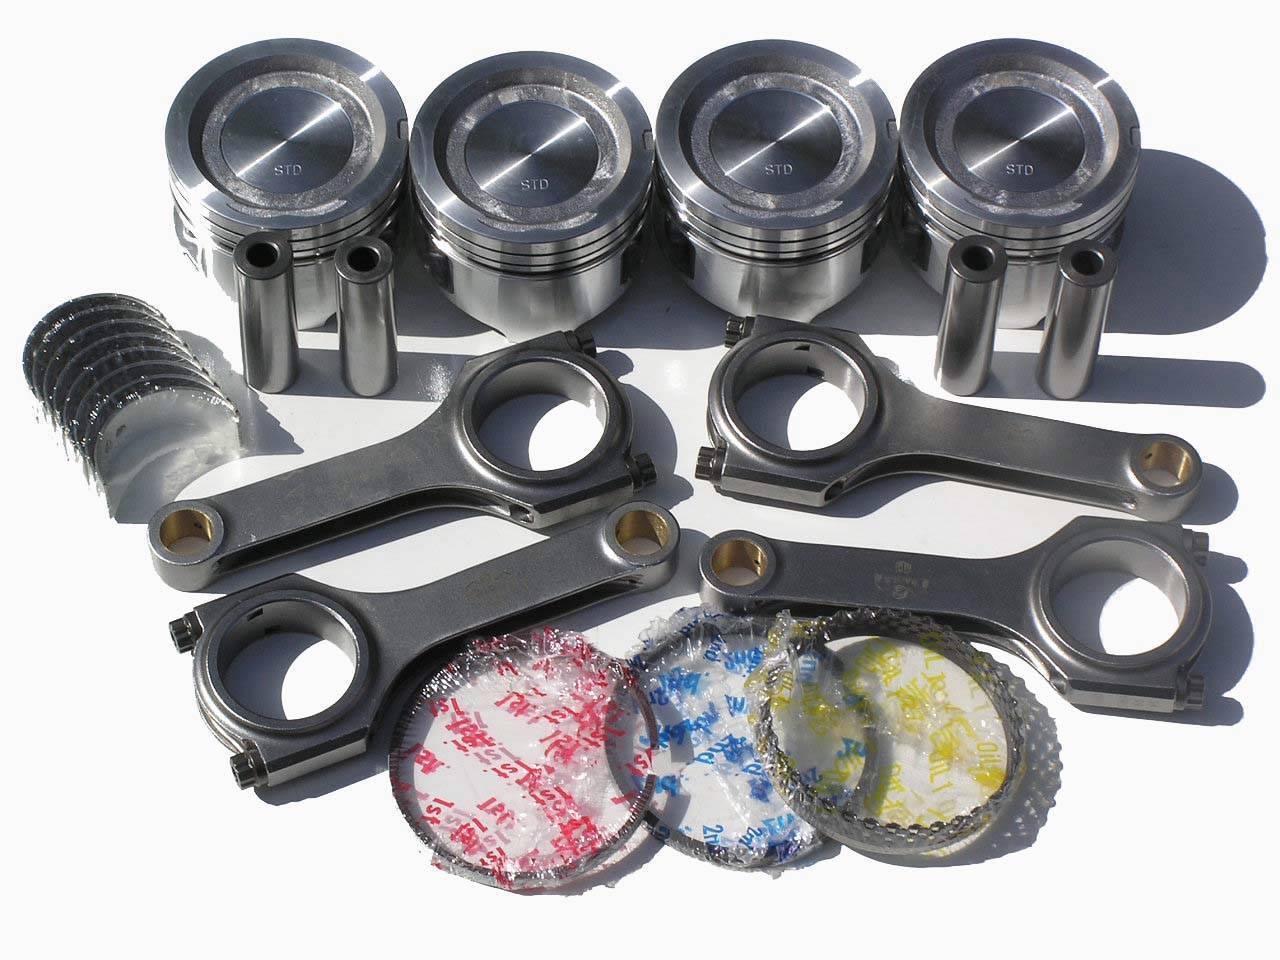 Nippon Racing Jdm Toyota 22r Turbo Engine Kit Pistons